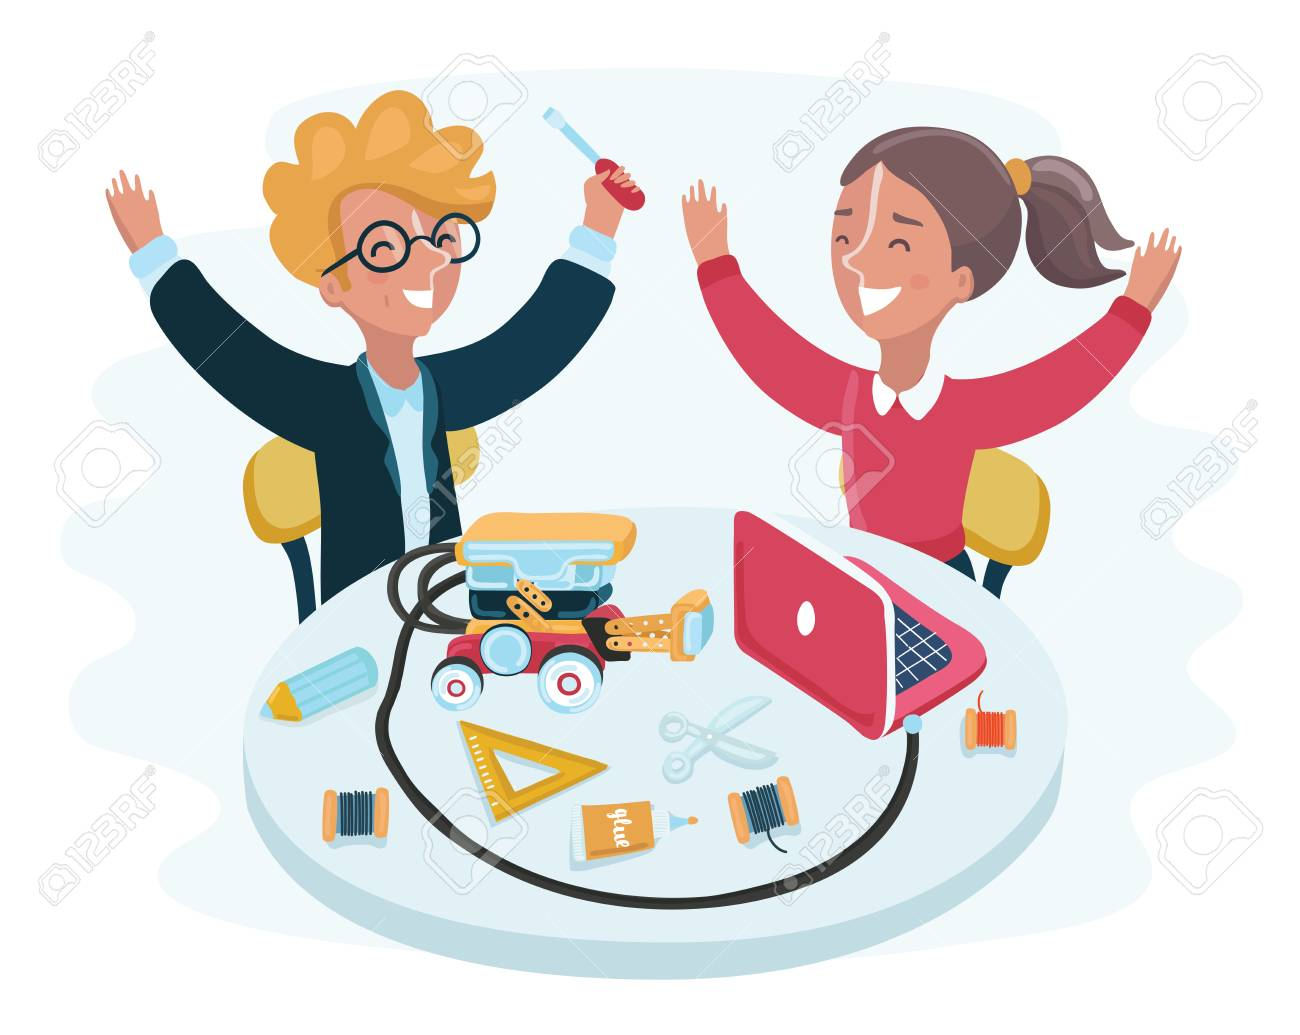 Vector Cartoon Illustration Of Smiling Children Sitting At Laptops